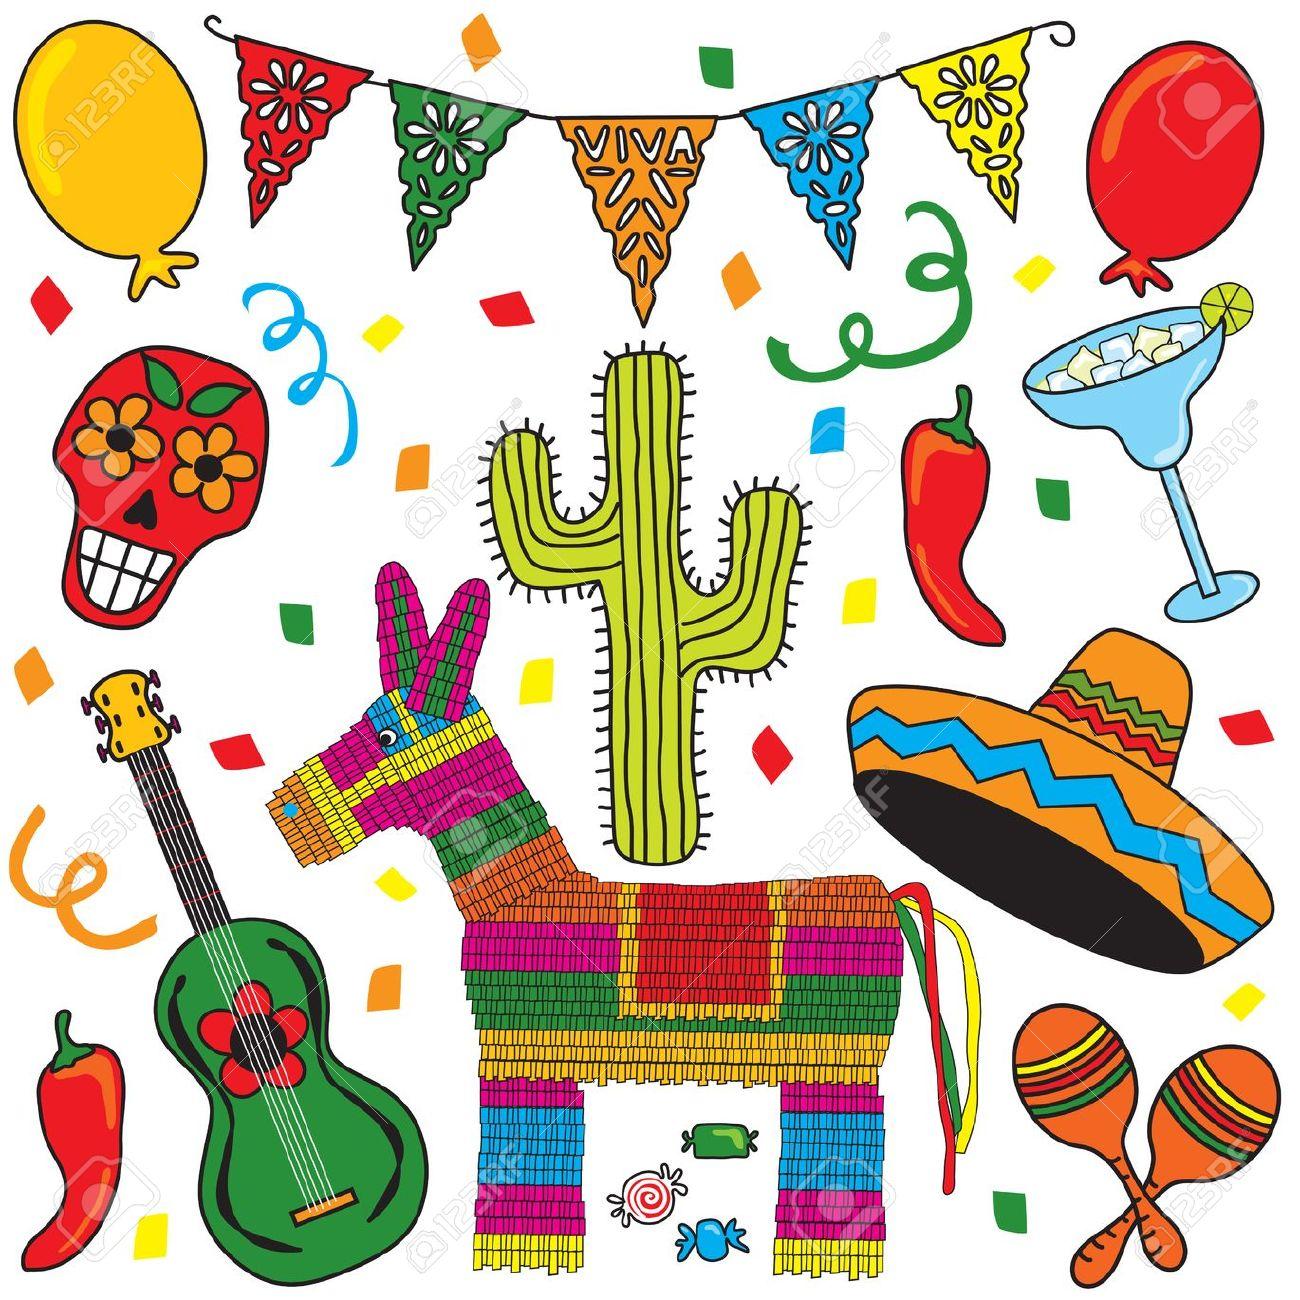 Sehr gut clipart picture black and white ClipArt Mexikanische Fiesta Individuell Gruppiert. Sehr Gut Für ... picture black and white